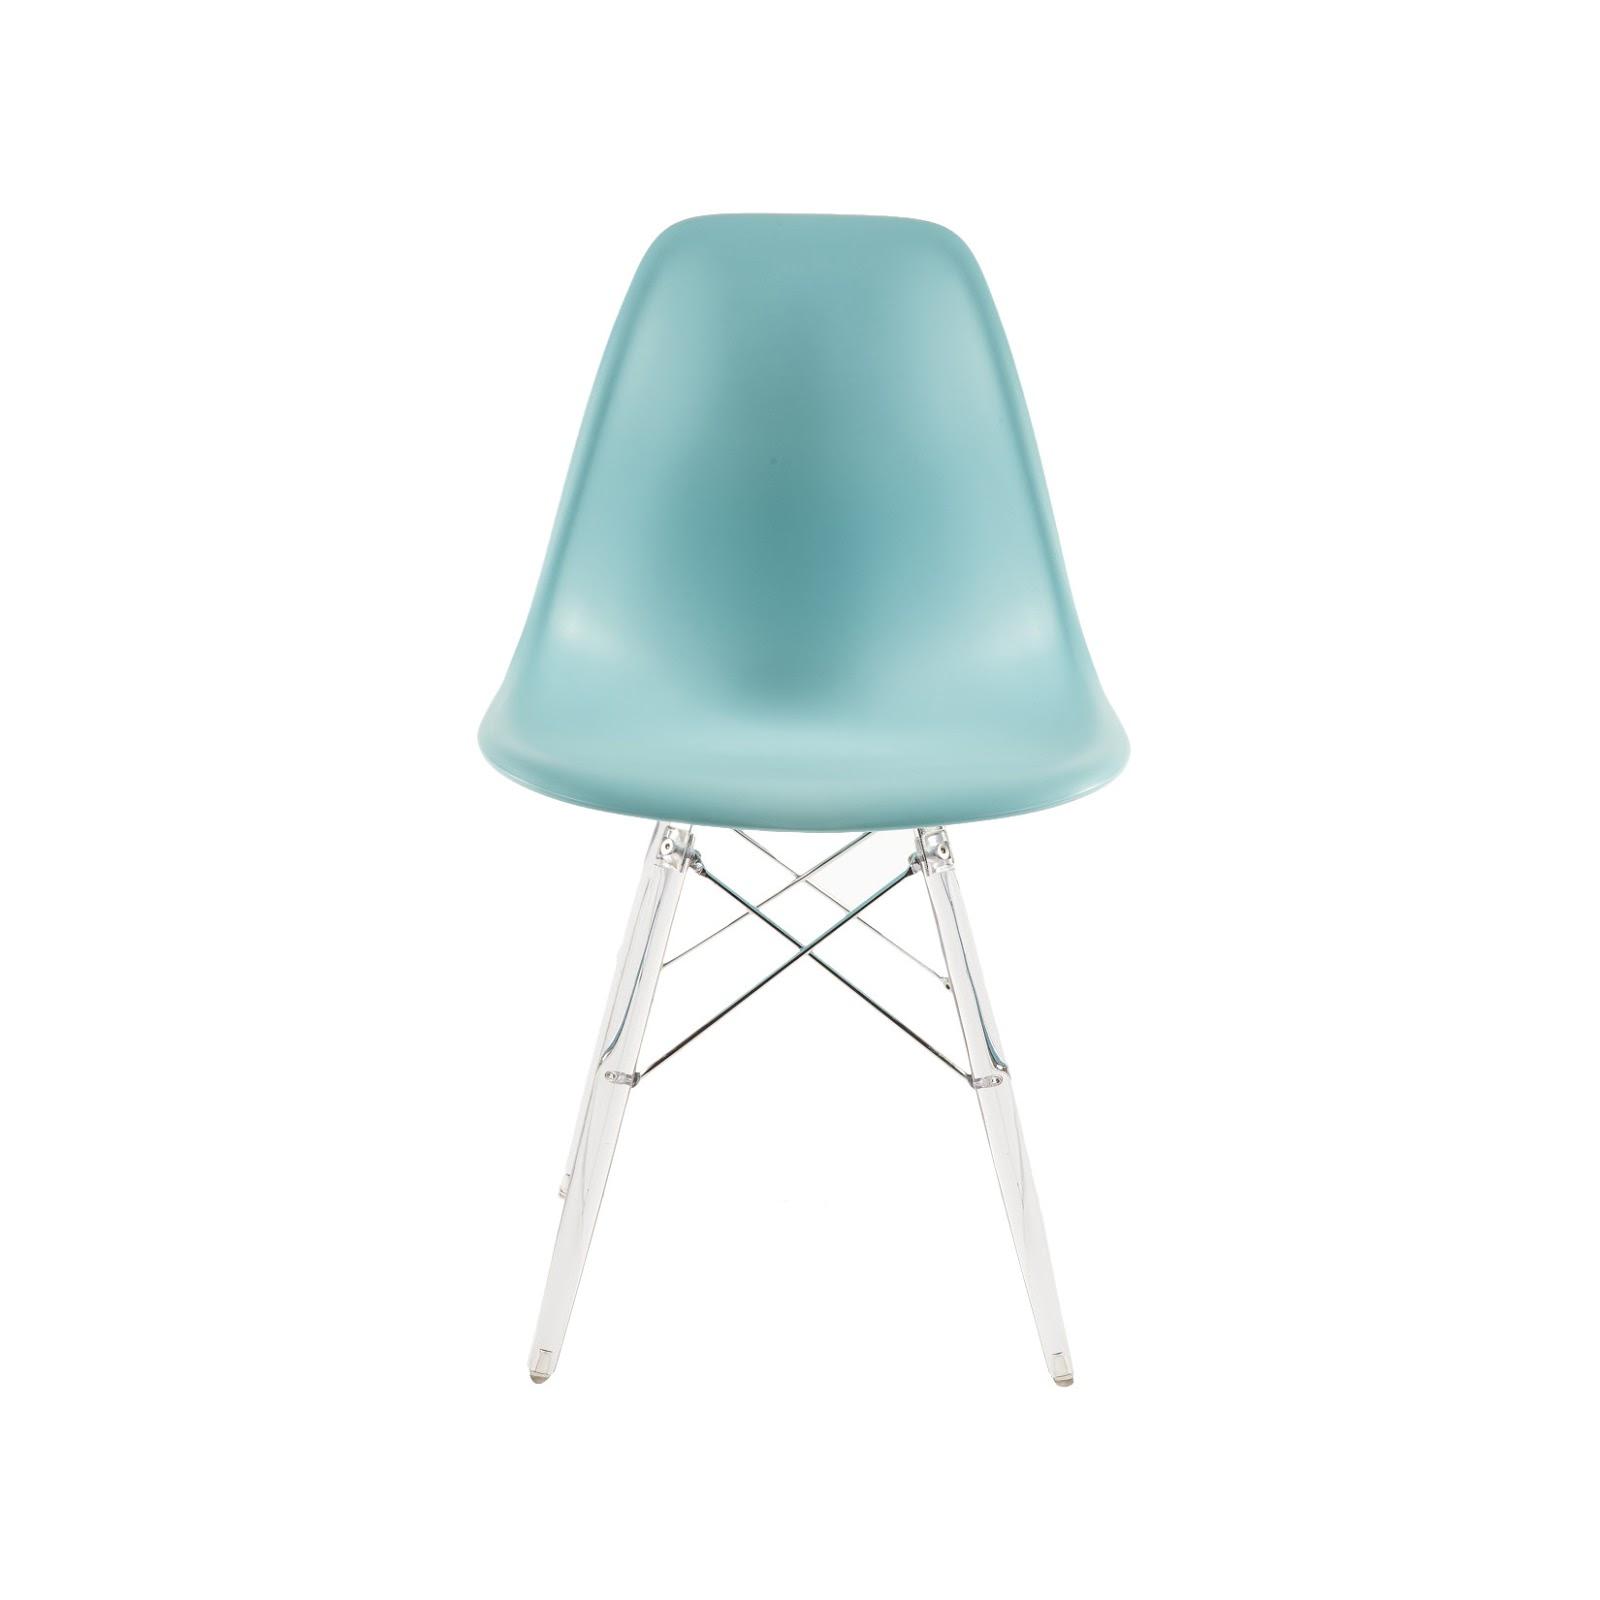 turquoise mid-century modern dining chair // Wayfair